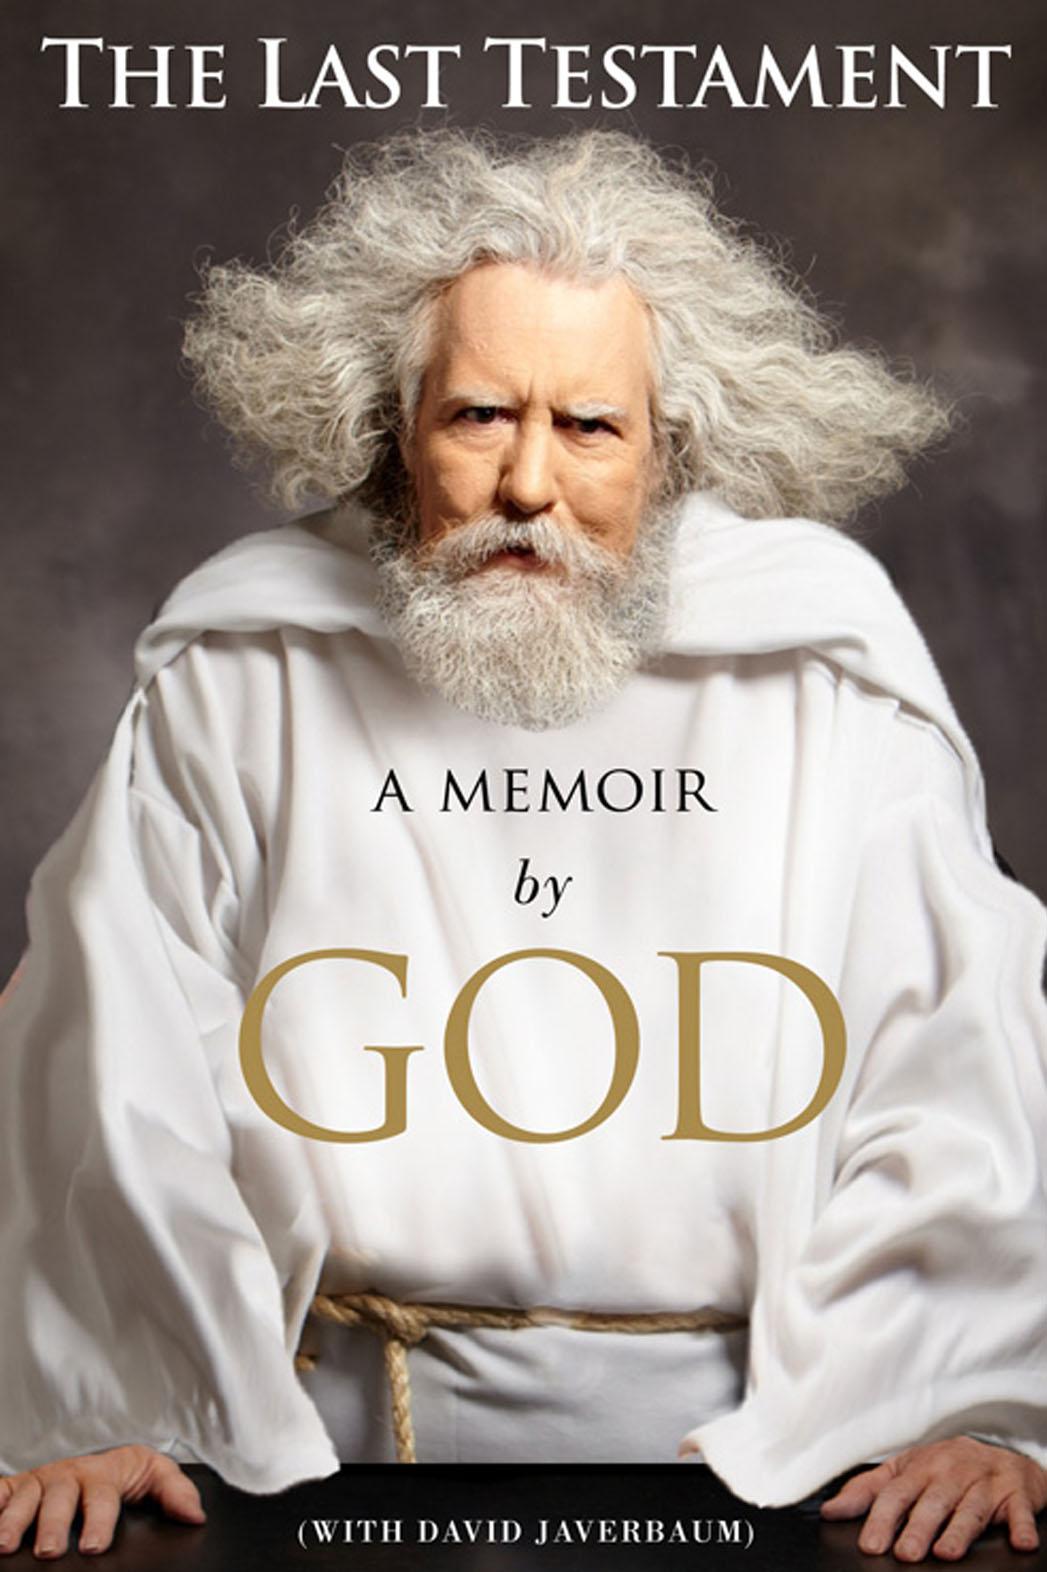 The Last Testament: A Memoir by God Book Cover - P 2014